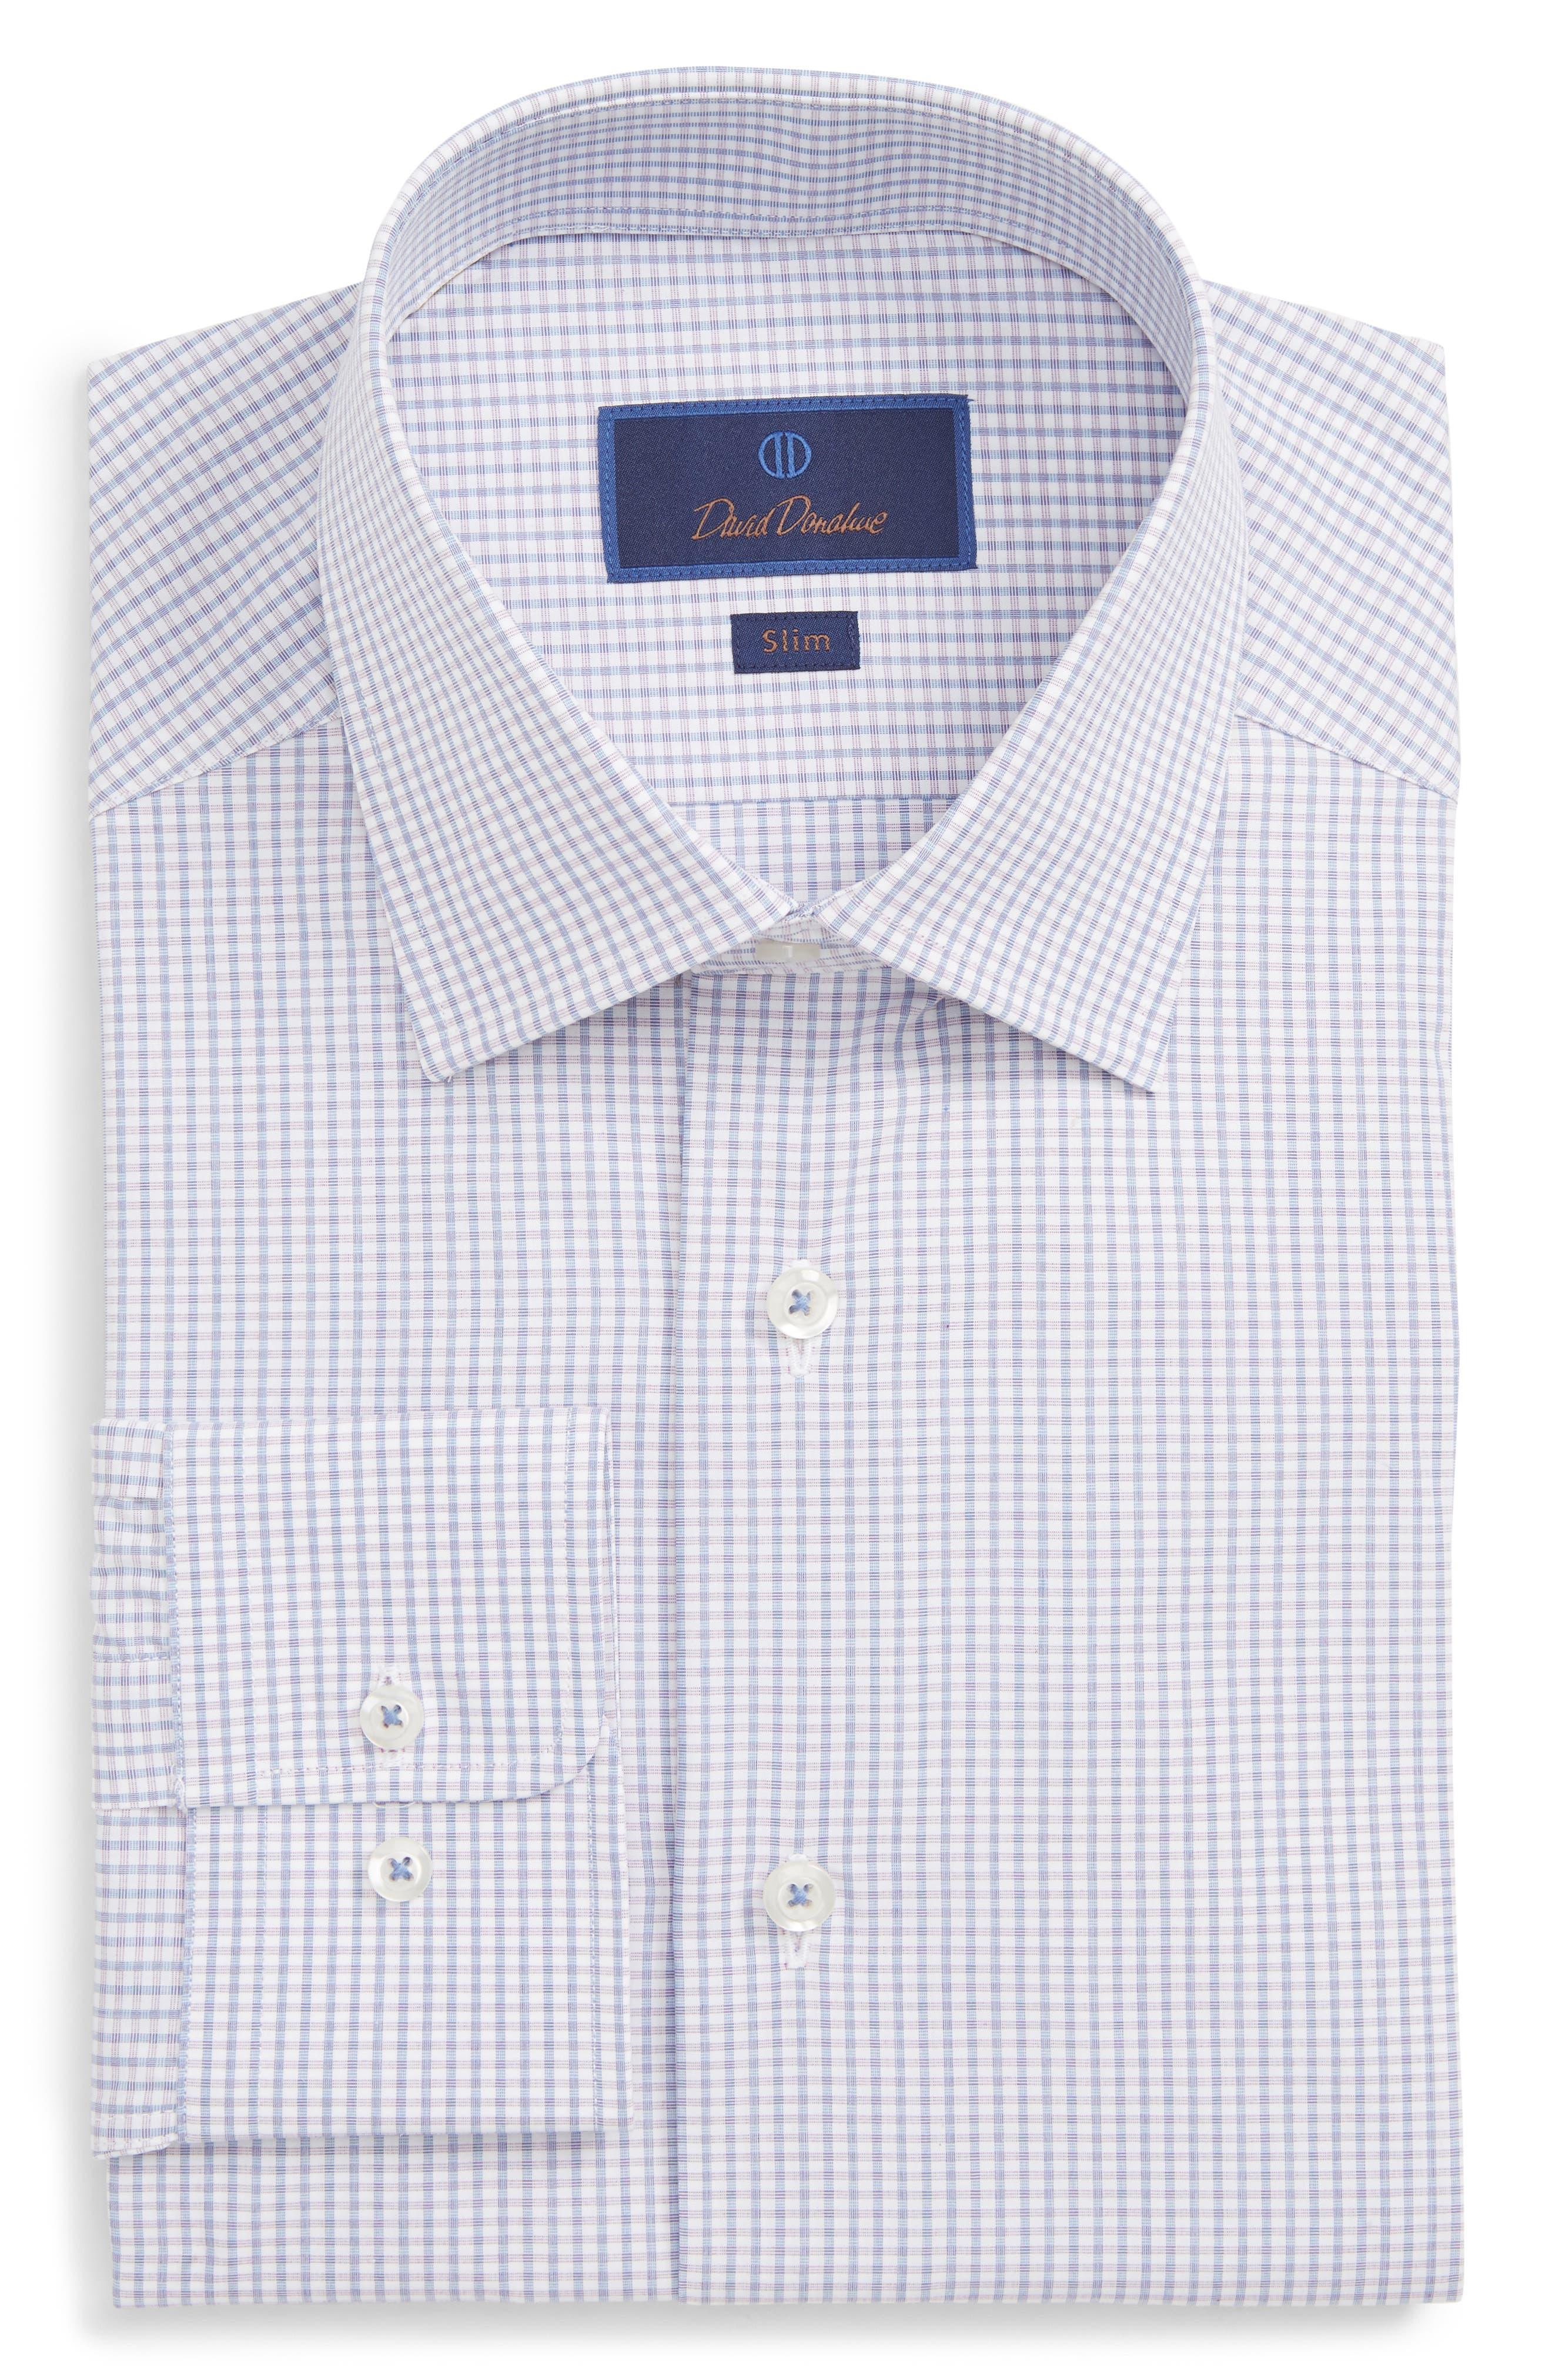 Slim Fit Gingham Dress Shirt, Main, color, PURPLE